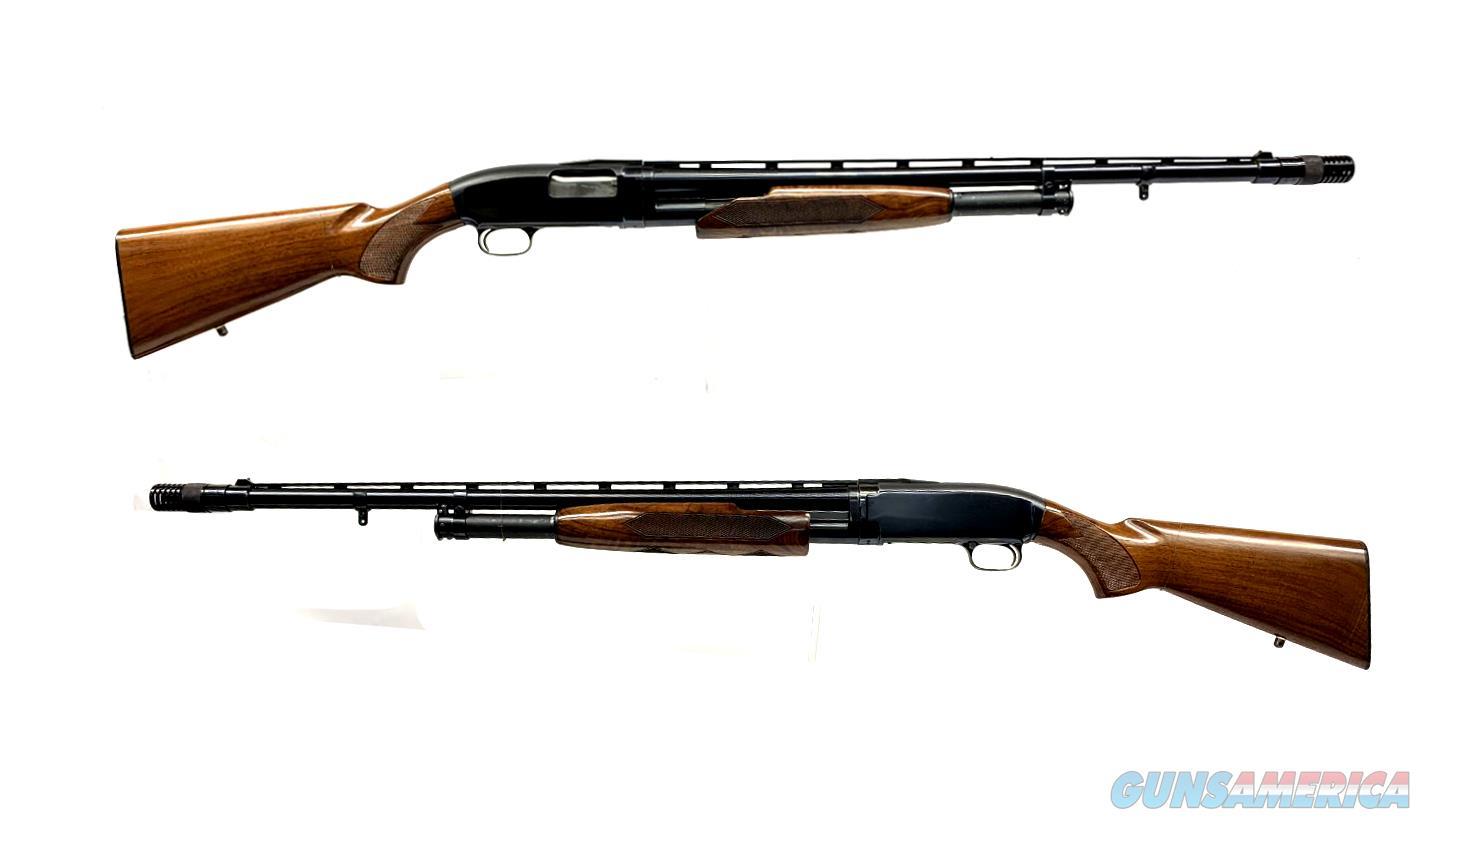 Winchester Model 12 Take-Down Shotgun  Guns > Shotguns > Winchester Shotguns - Modern > Pump Action > Trap/Skeet